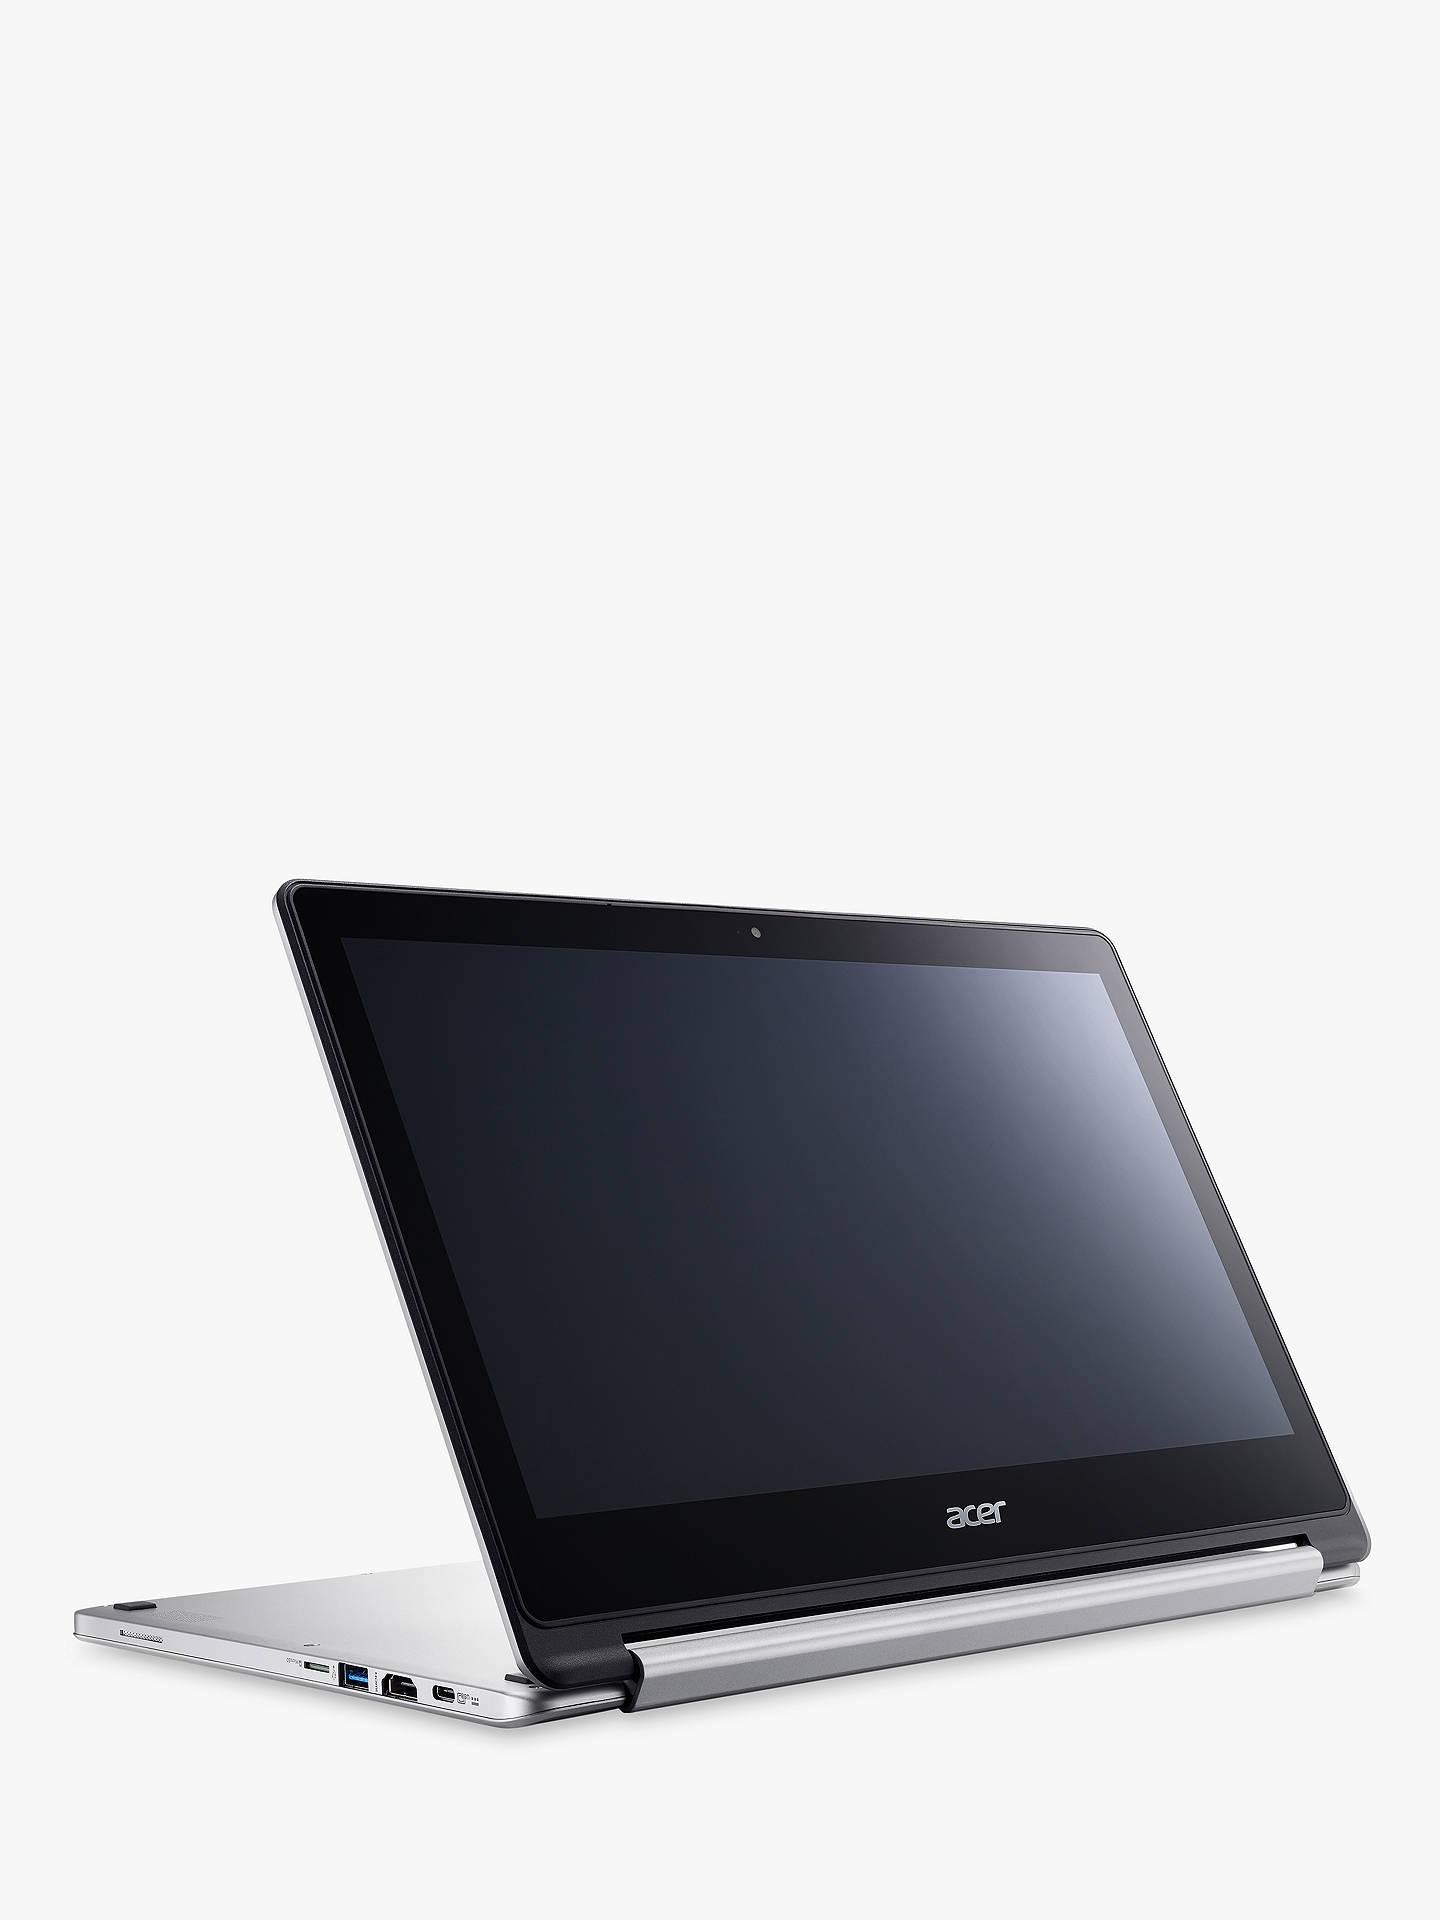 "Acer Chromebook CB5-312T-K1TR MediaTek M8173C Processor, 4GB RAM, 64GB eMMC  Flash, 13.3"" Touch Screen, Silver at John Lewis & Partners"